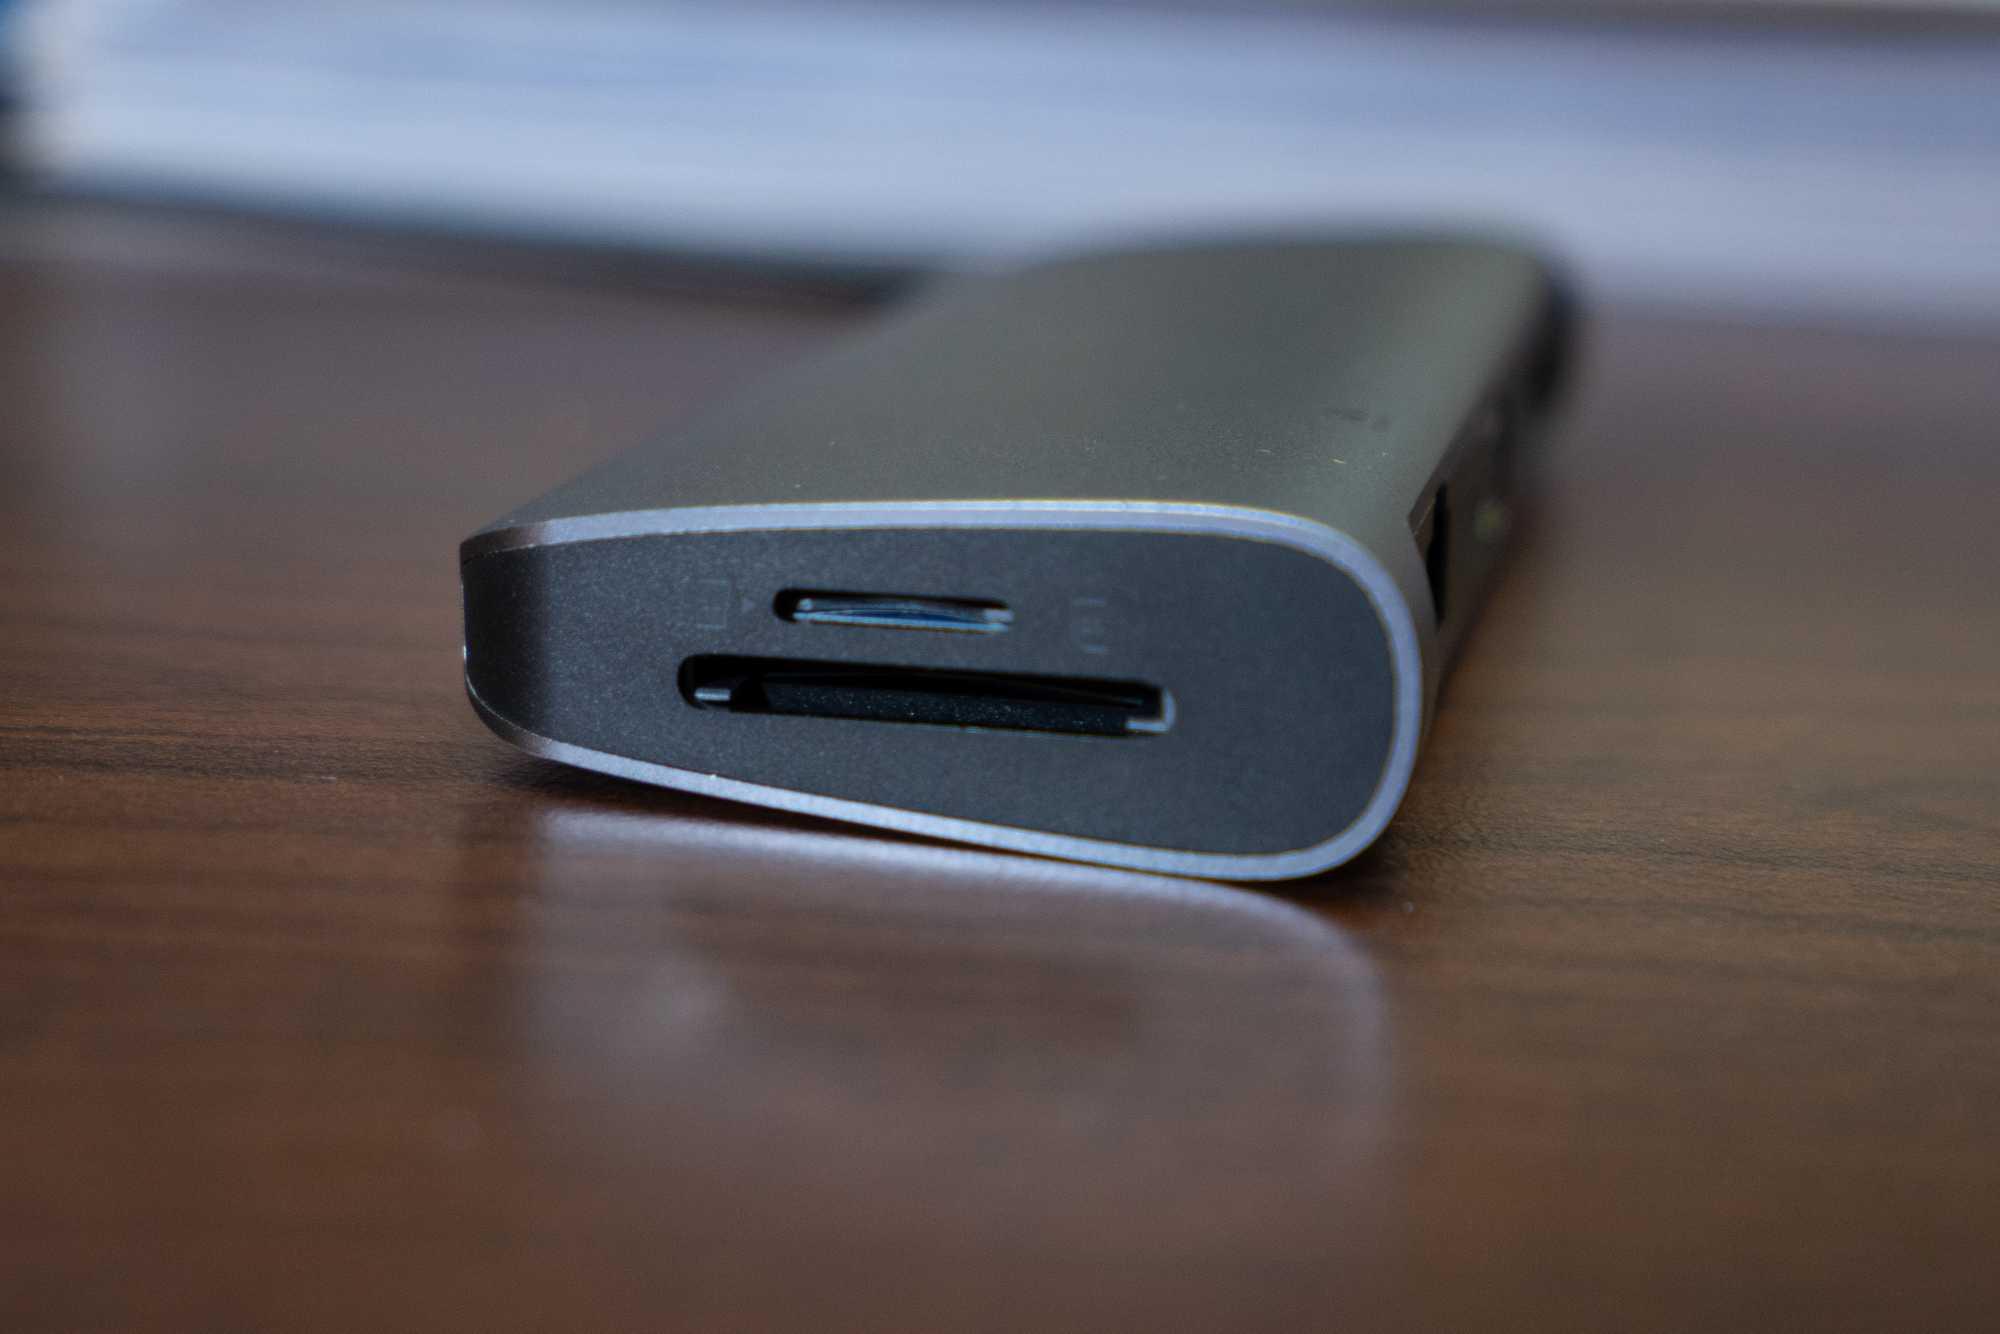 UGREEN USB-C 9-in 1 Multifunctional Adapter SD Card Reader